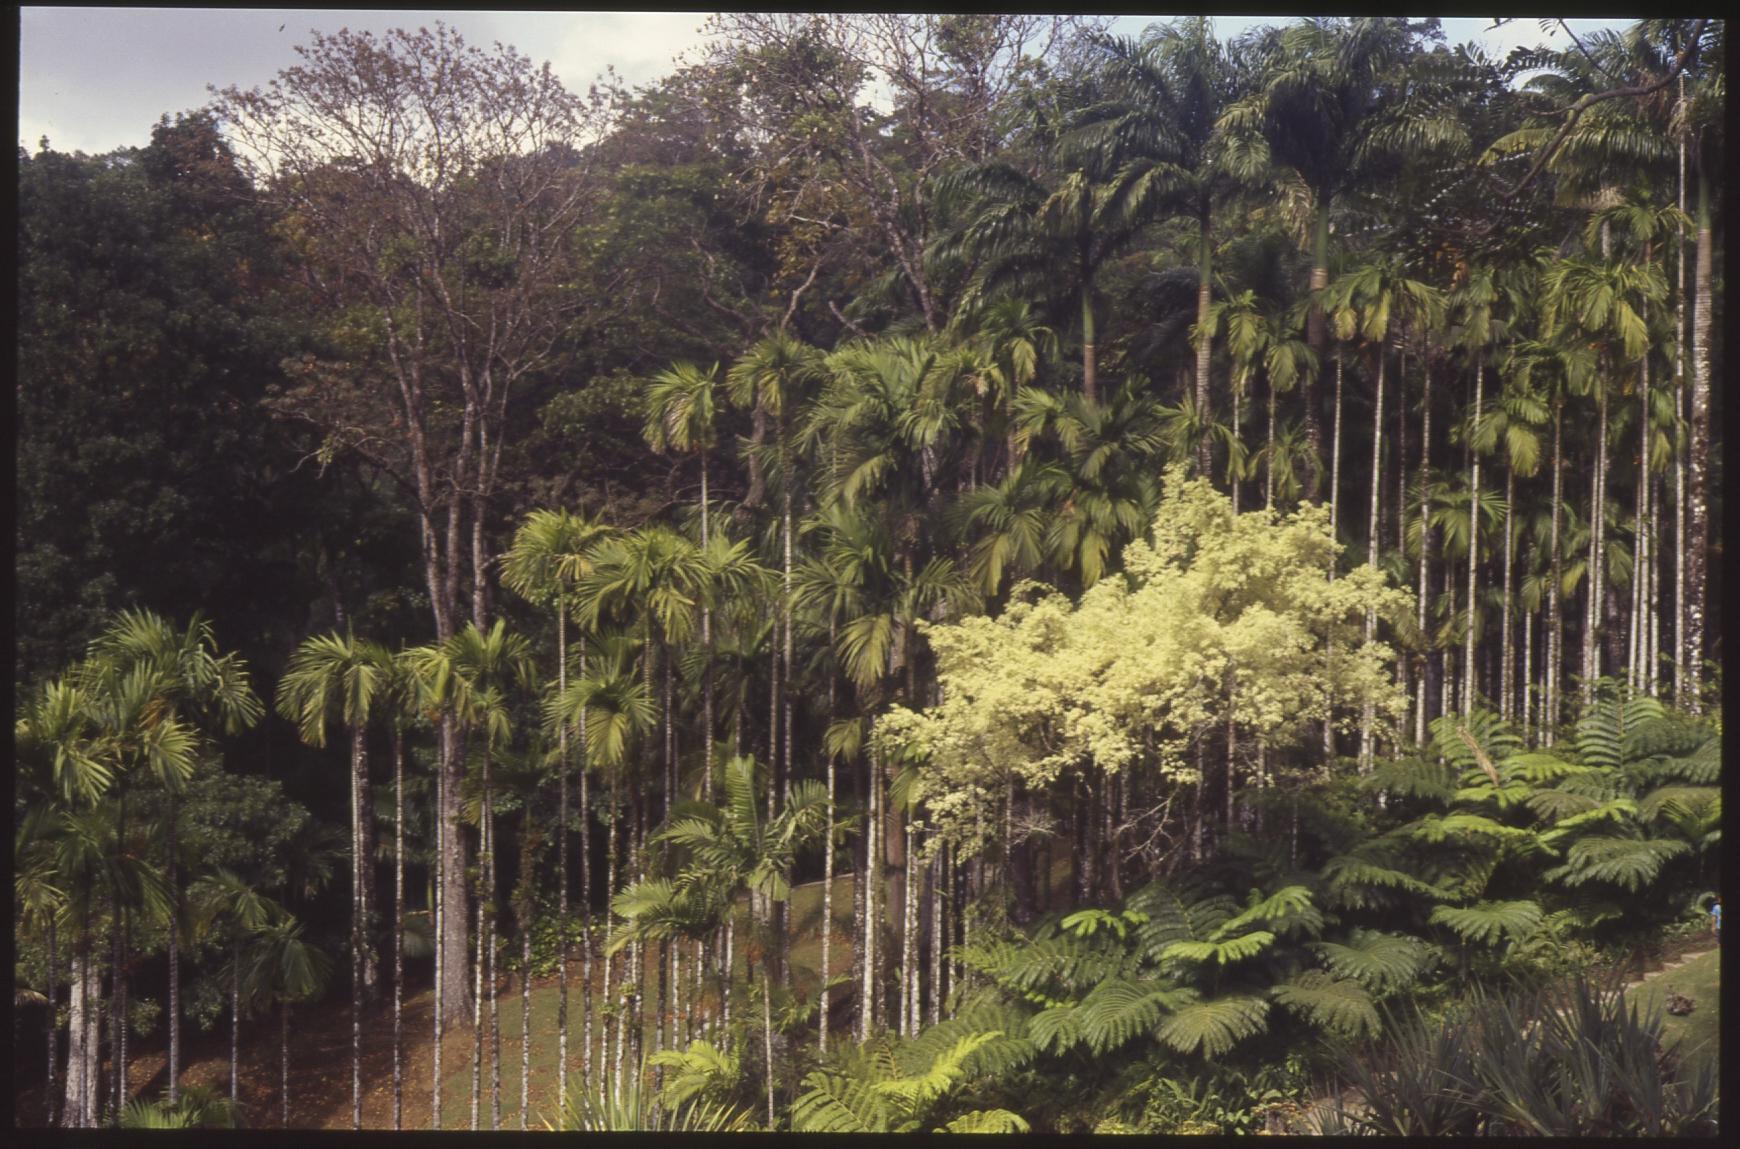 Martinique_film021 copy.jpg